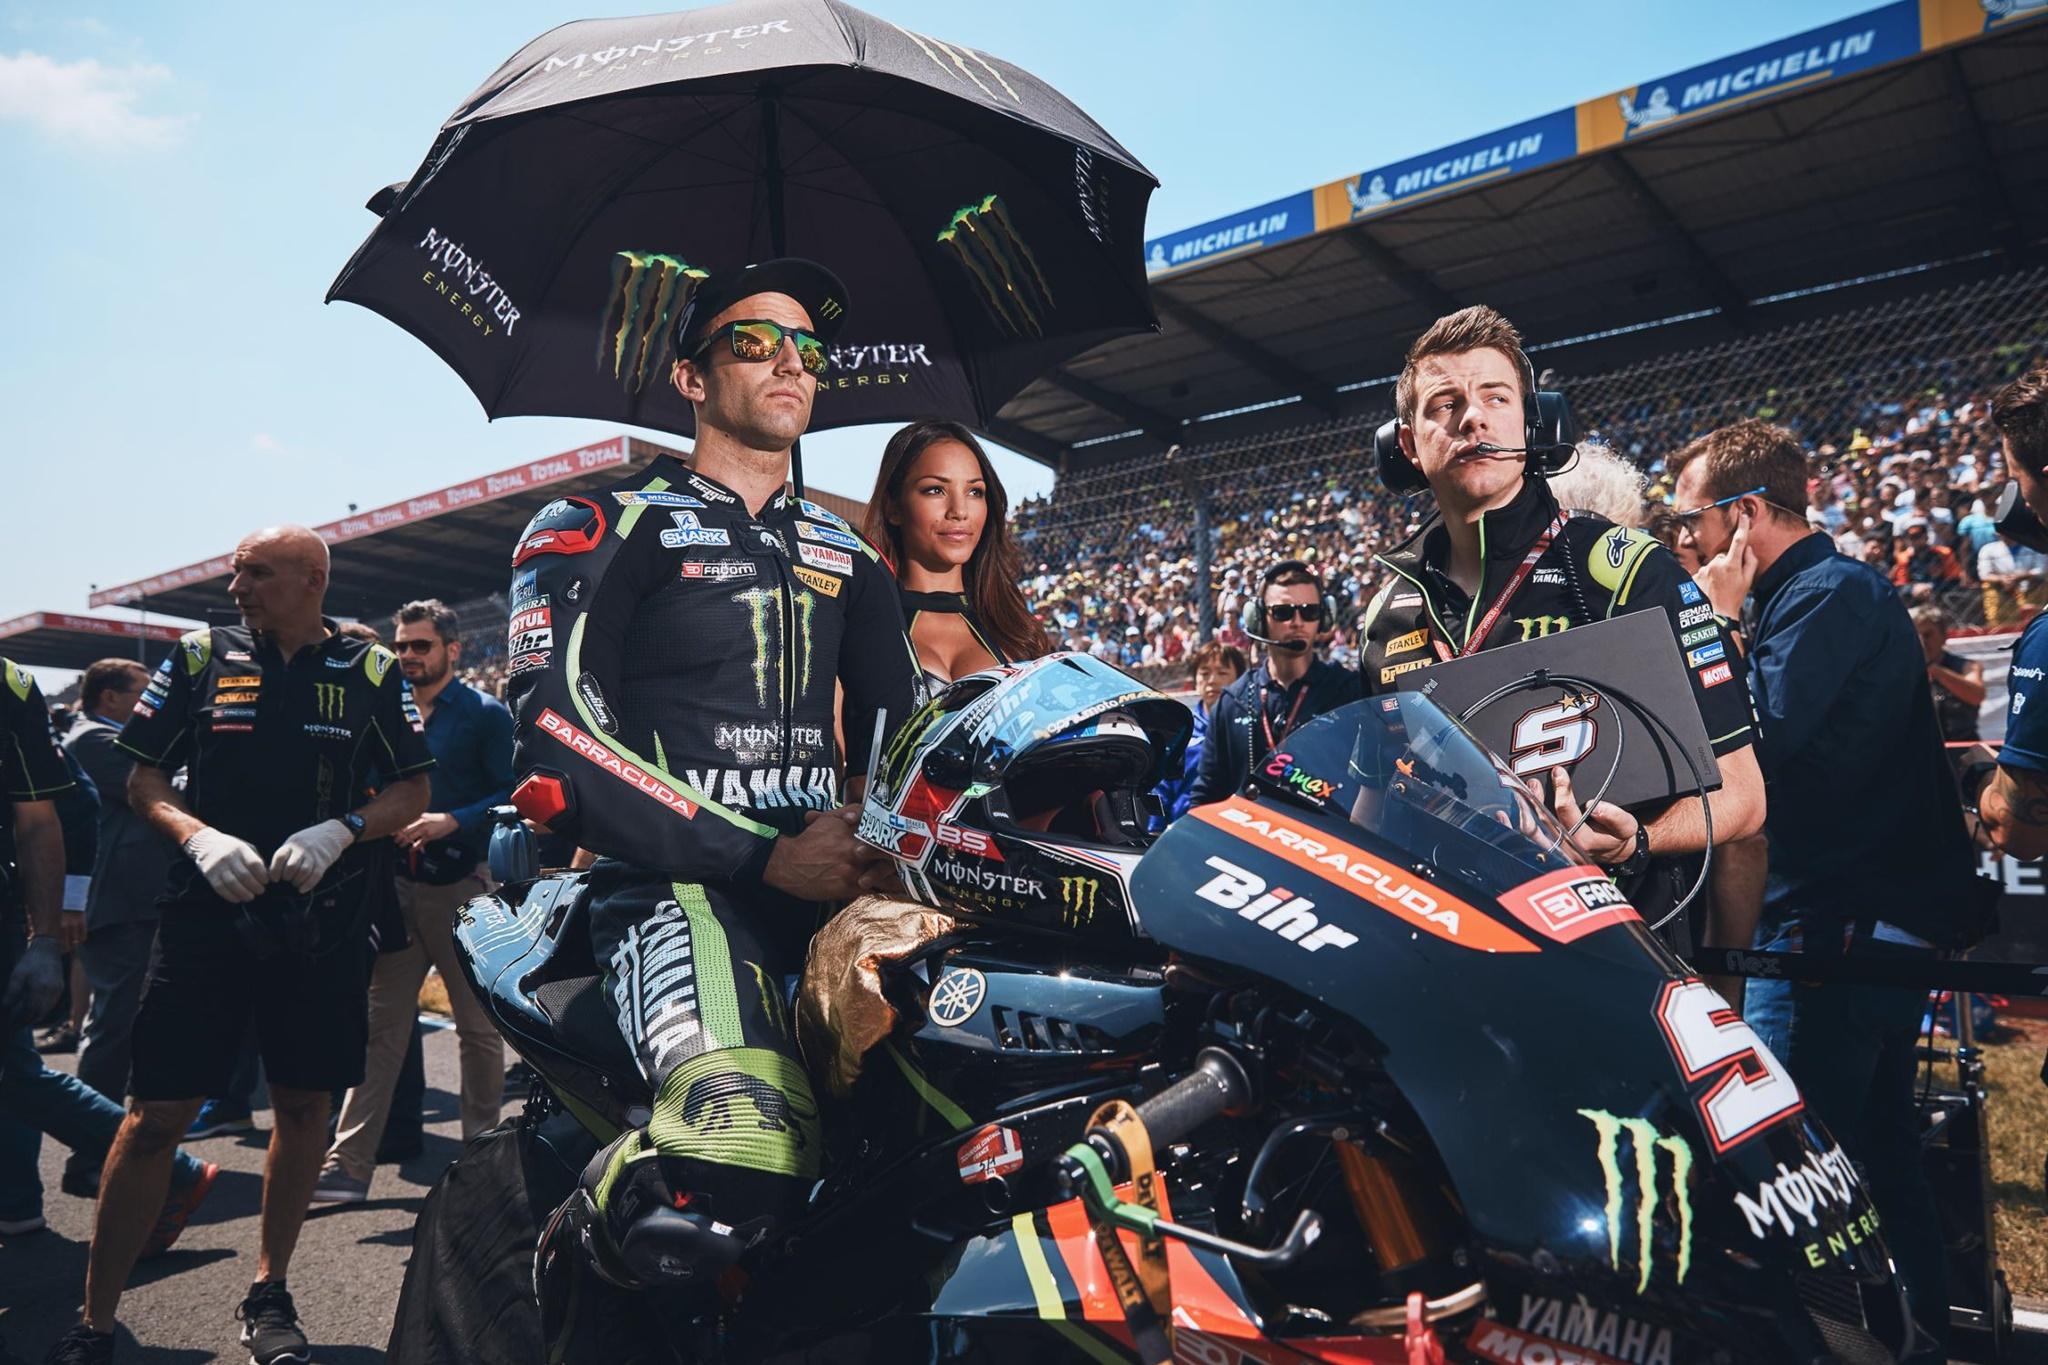 Moto_GP_18_Le_Mans_2018_Xe_Tinhte-011.jpg